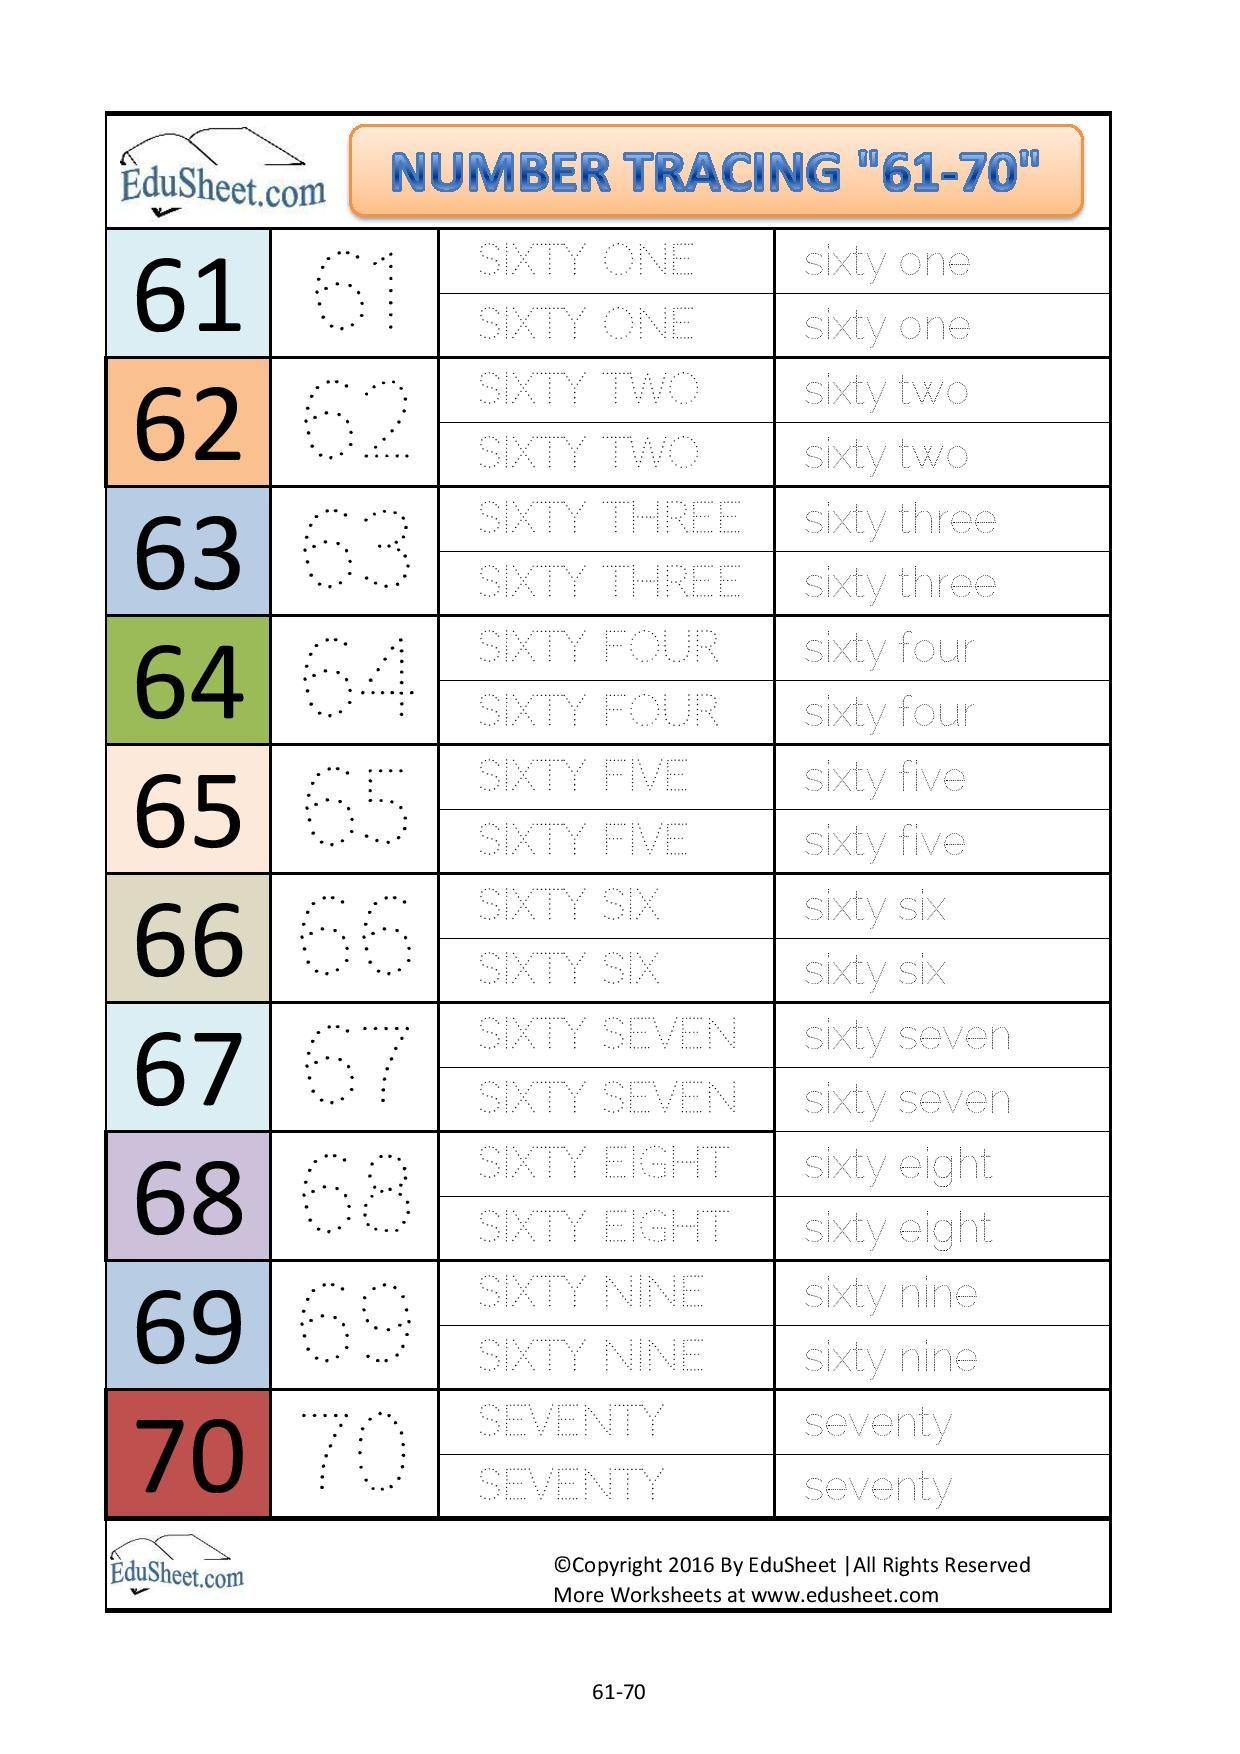 Number Tracing Worksheets 61 70 Www Edusheet Com Handwriting Worksheets Tracing Worksheets Free Math Worksheets [ 1754 x 1240 Pixel ]